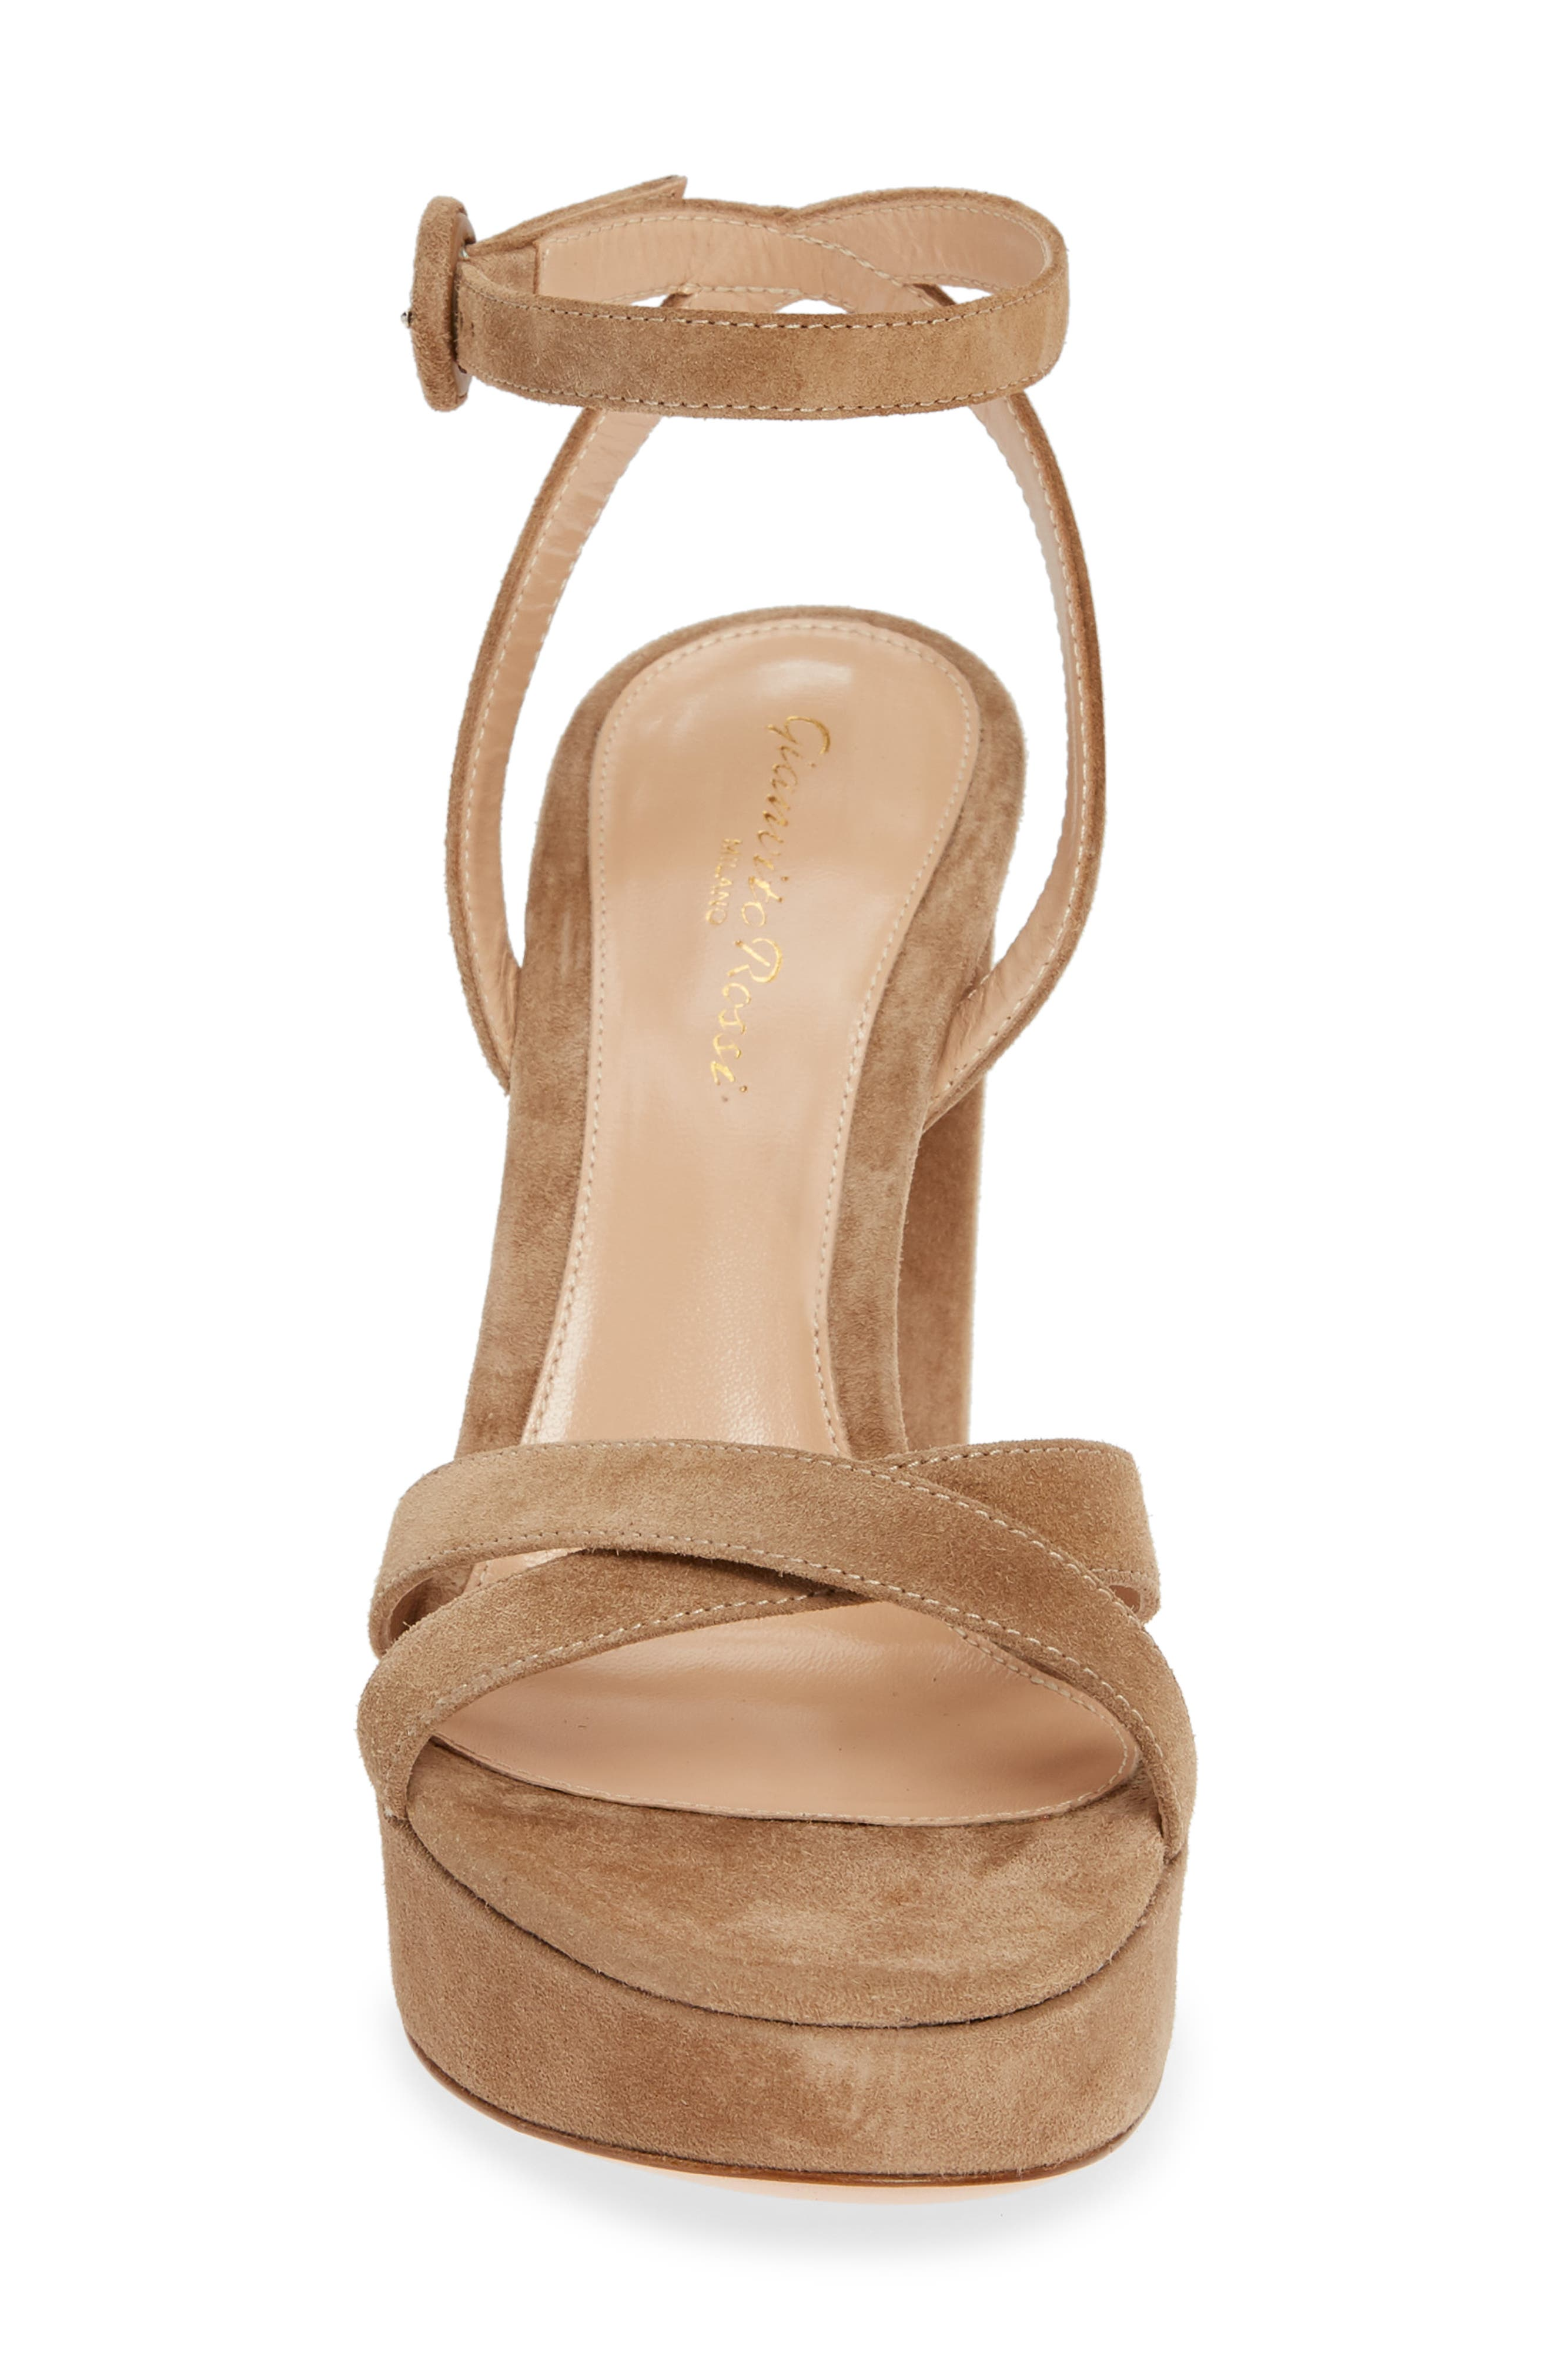 GIANVITO ROSSI, Ankle Strap Platform Sandal, Alternate thumbnail 4, color, CAMEL SUEDE